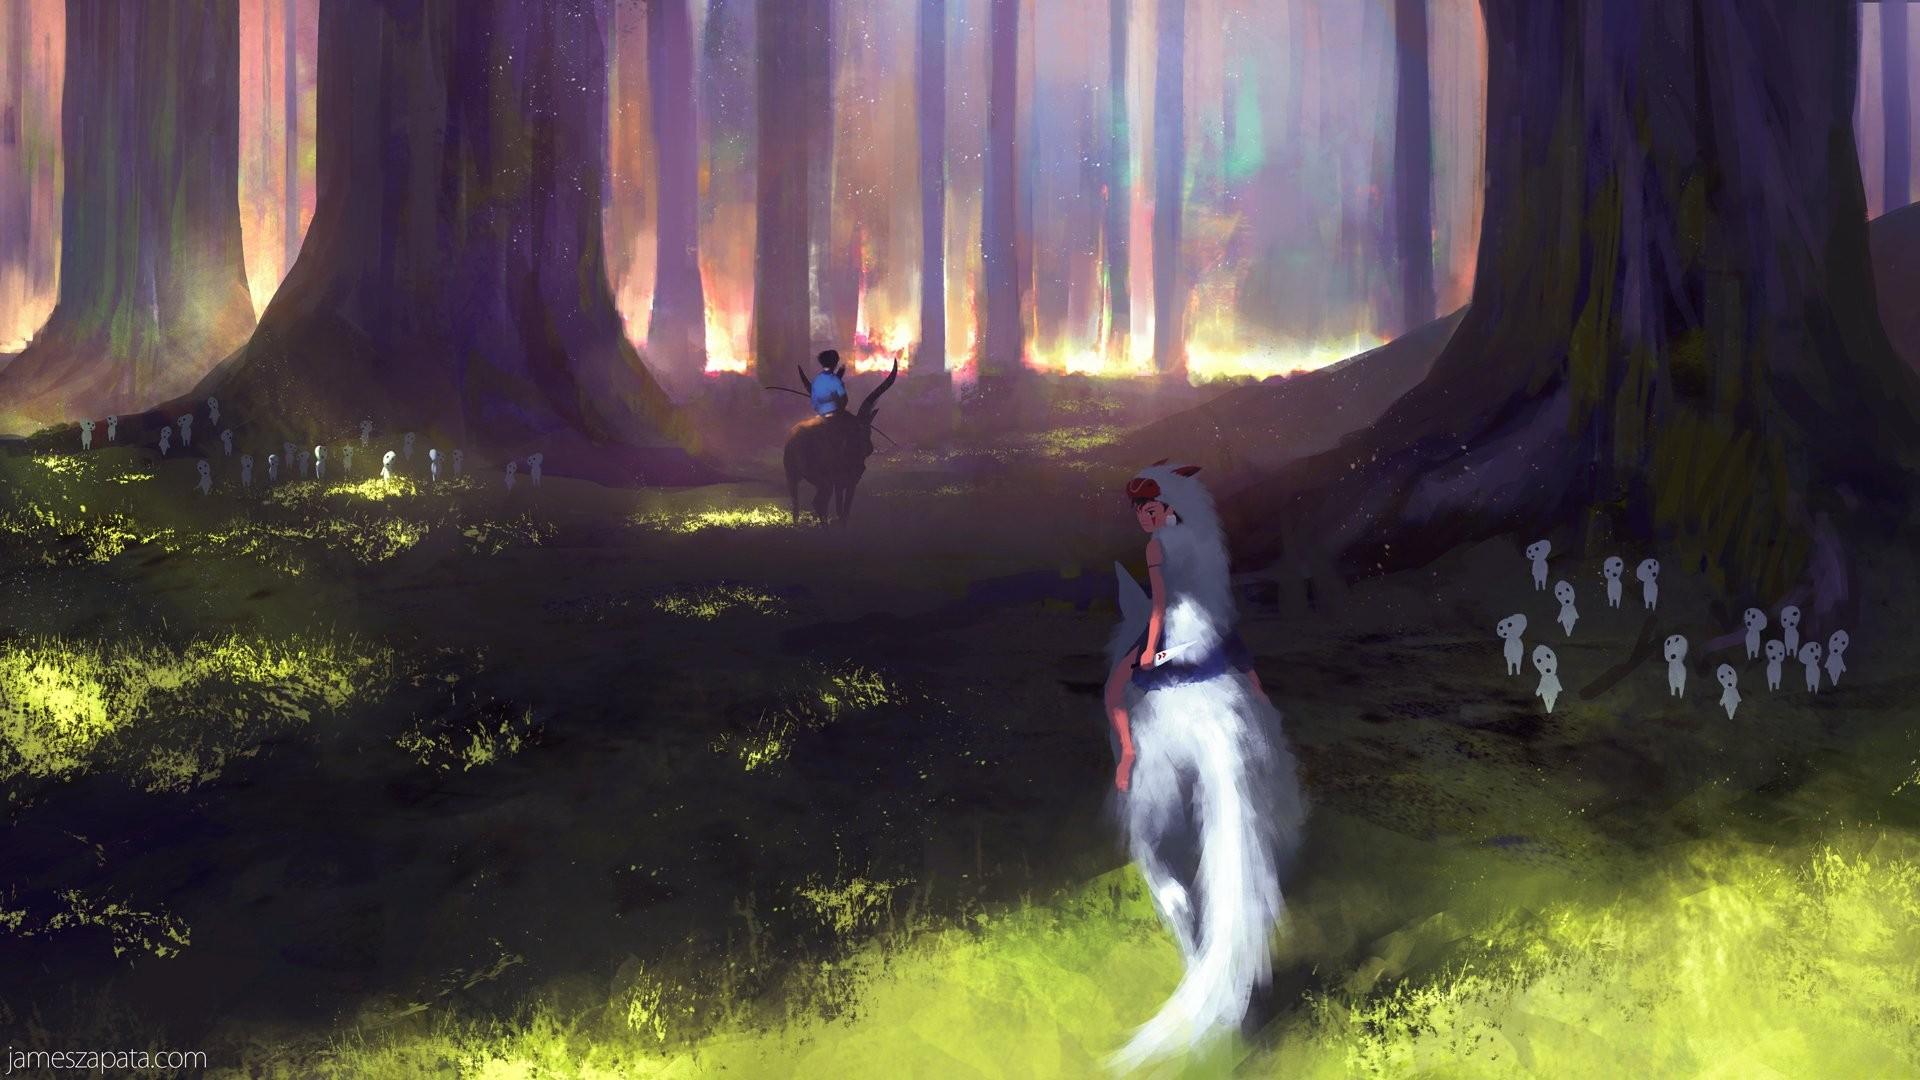 Princess Mononoke wallpaper ·① Download free beautiful ...